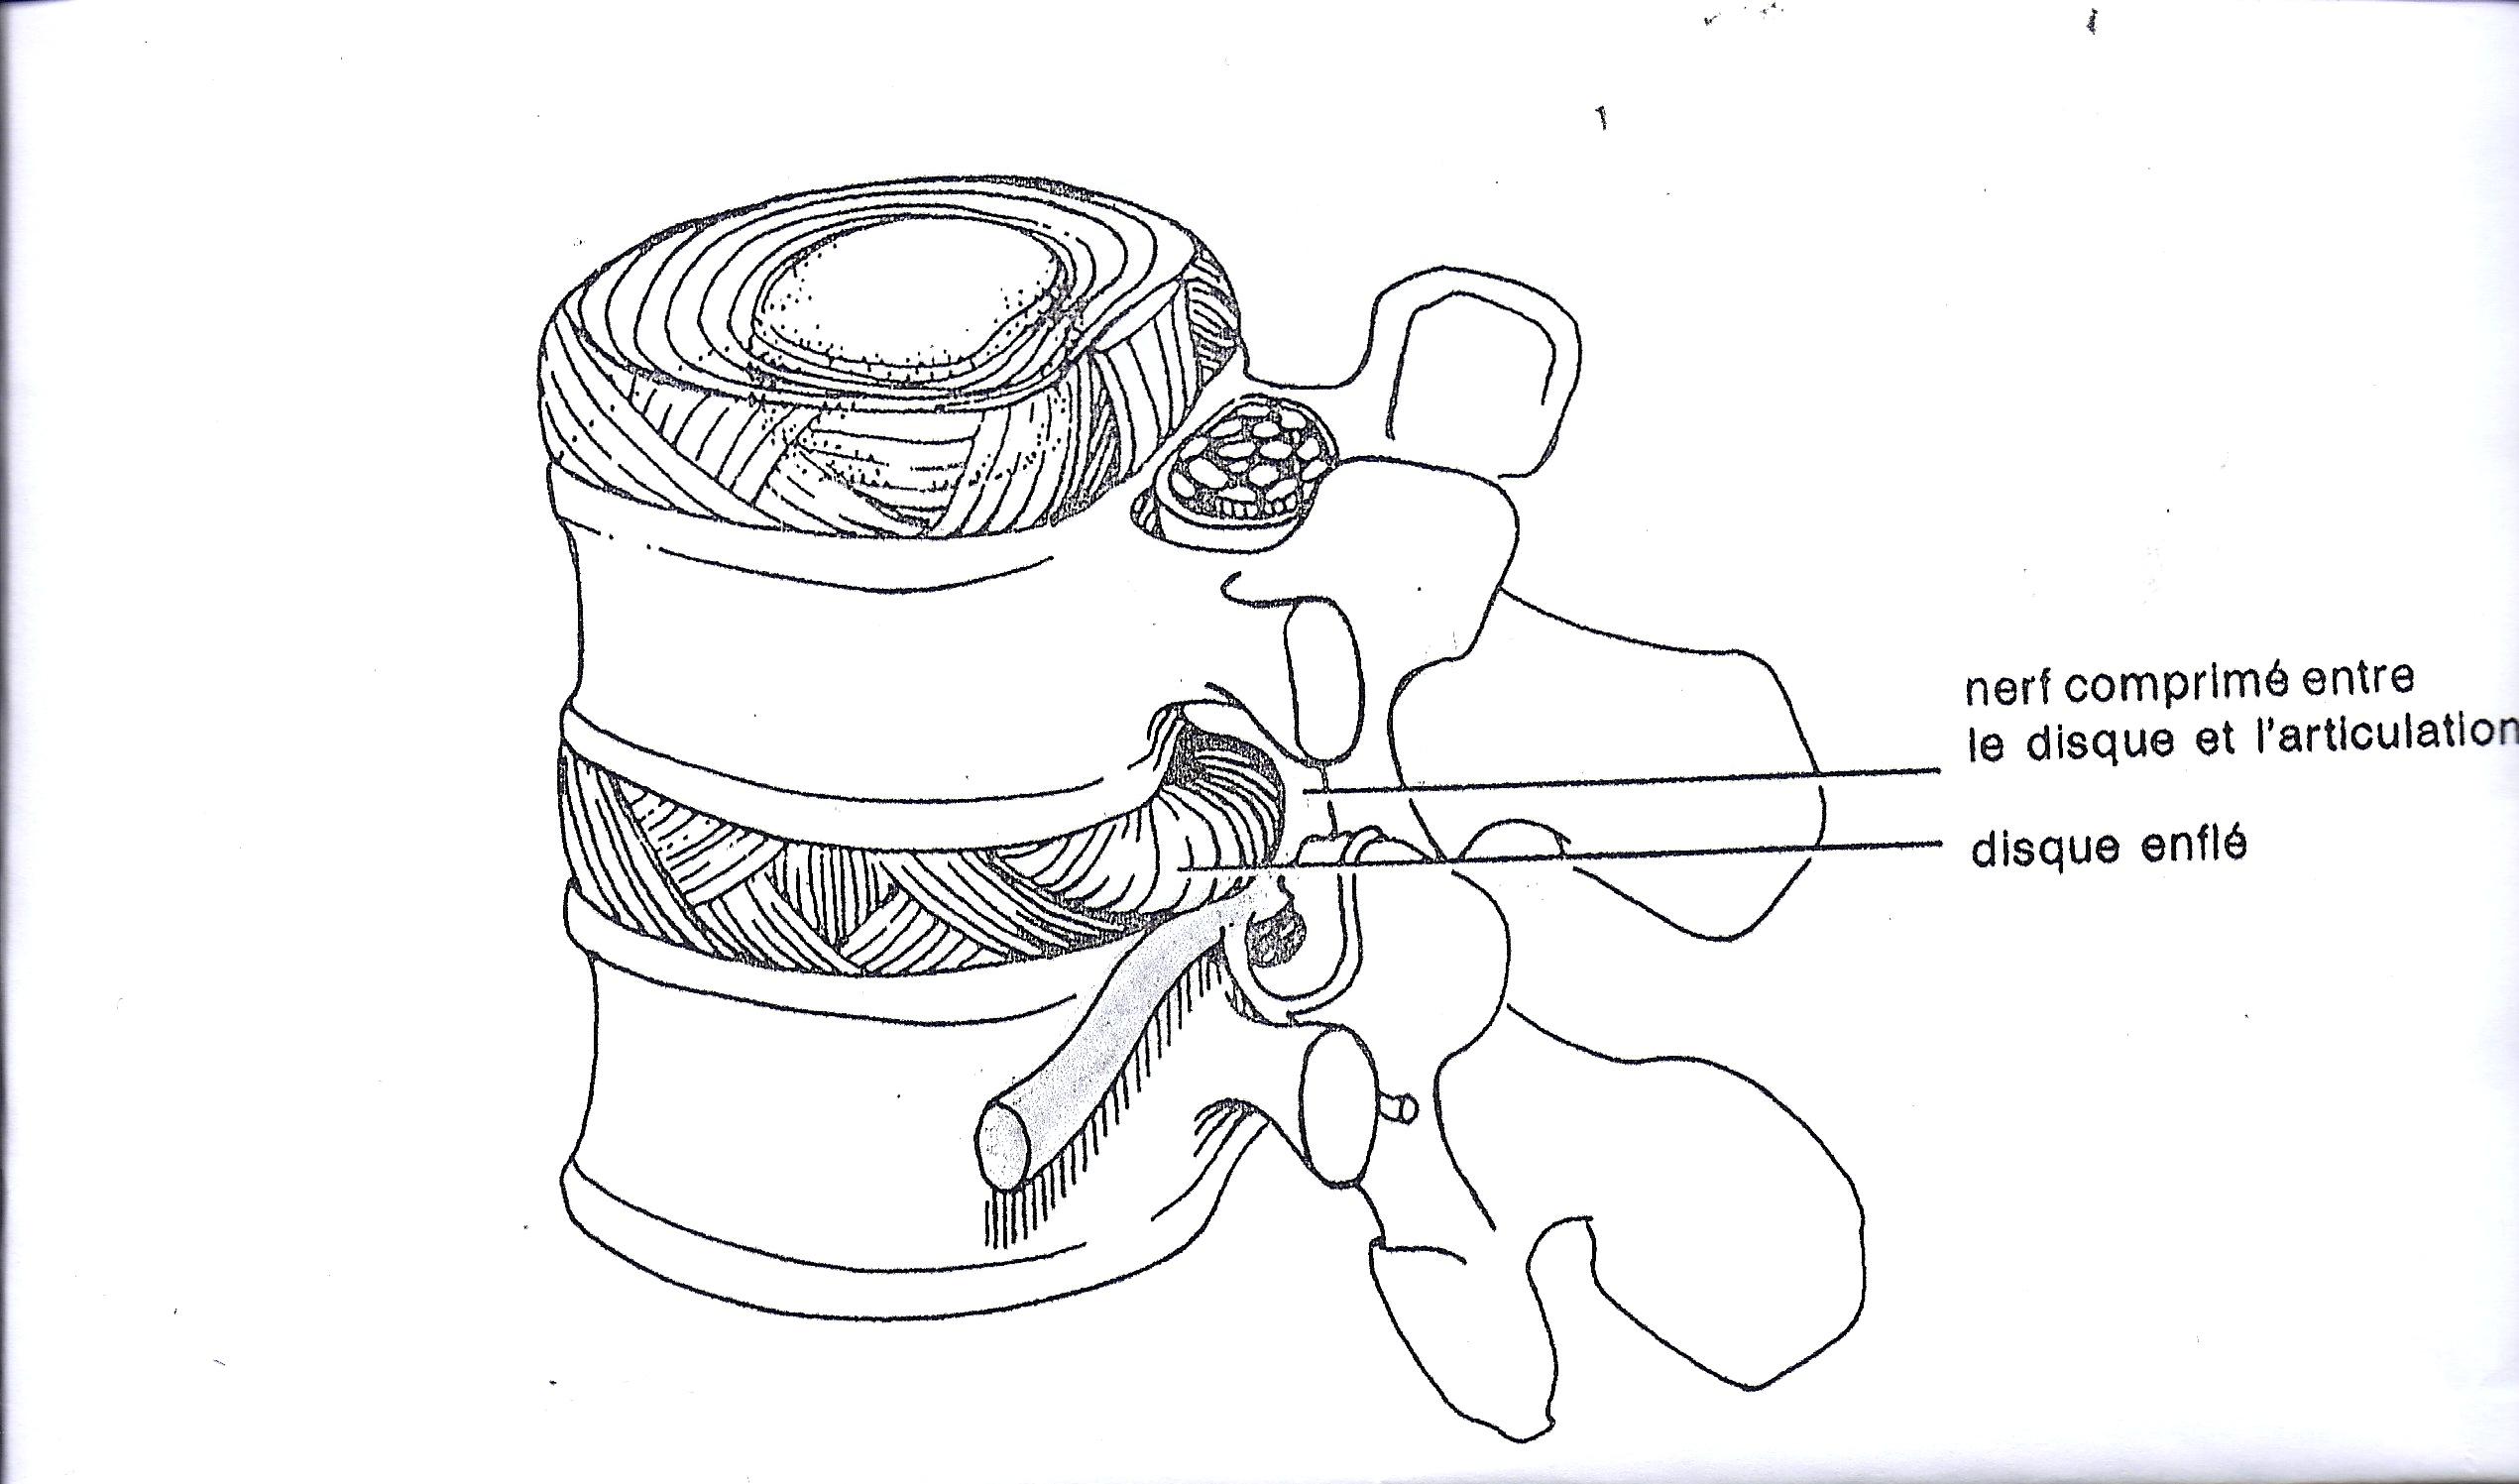 La zone sur lépine dorsale dosteokhondroza